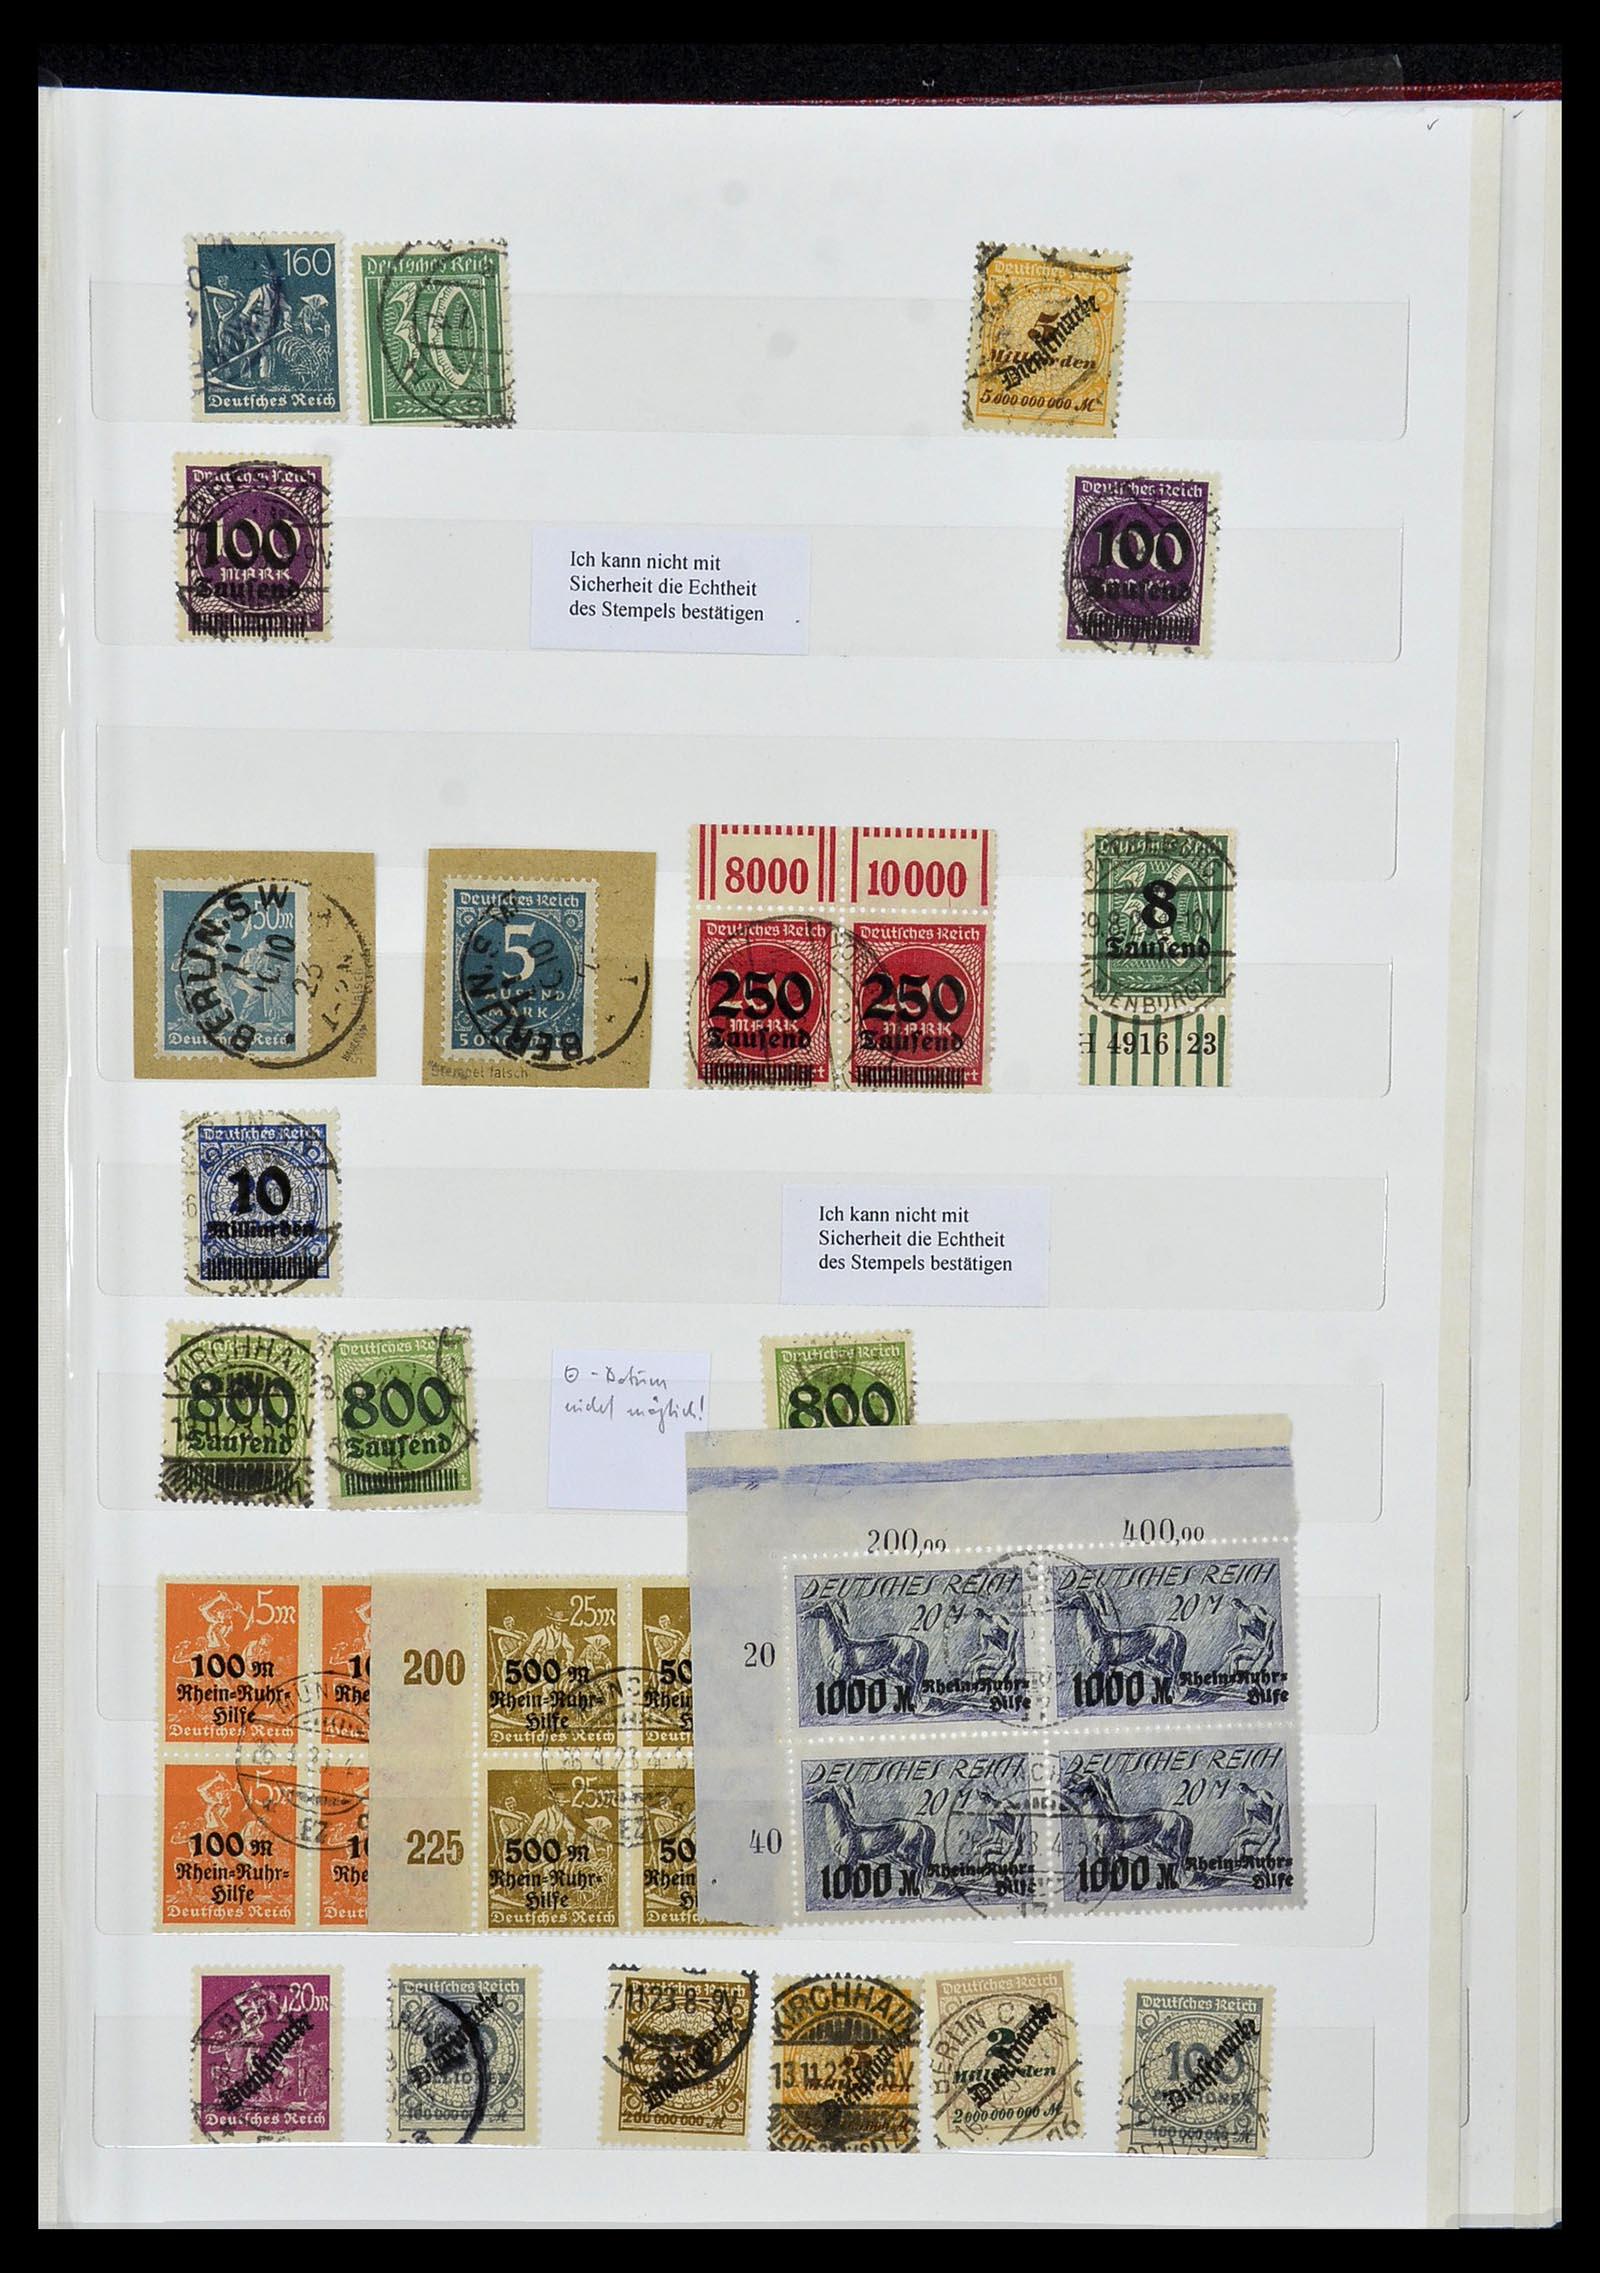 34069 014 - Postzegelverzameling 34069 Duitsland 1855-1952.